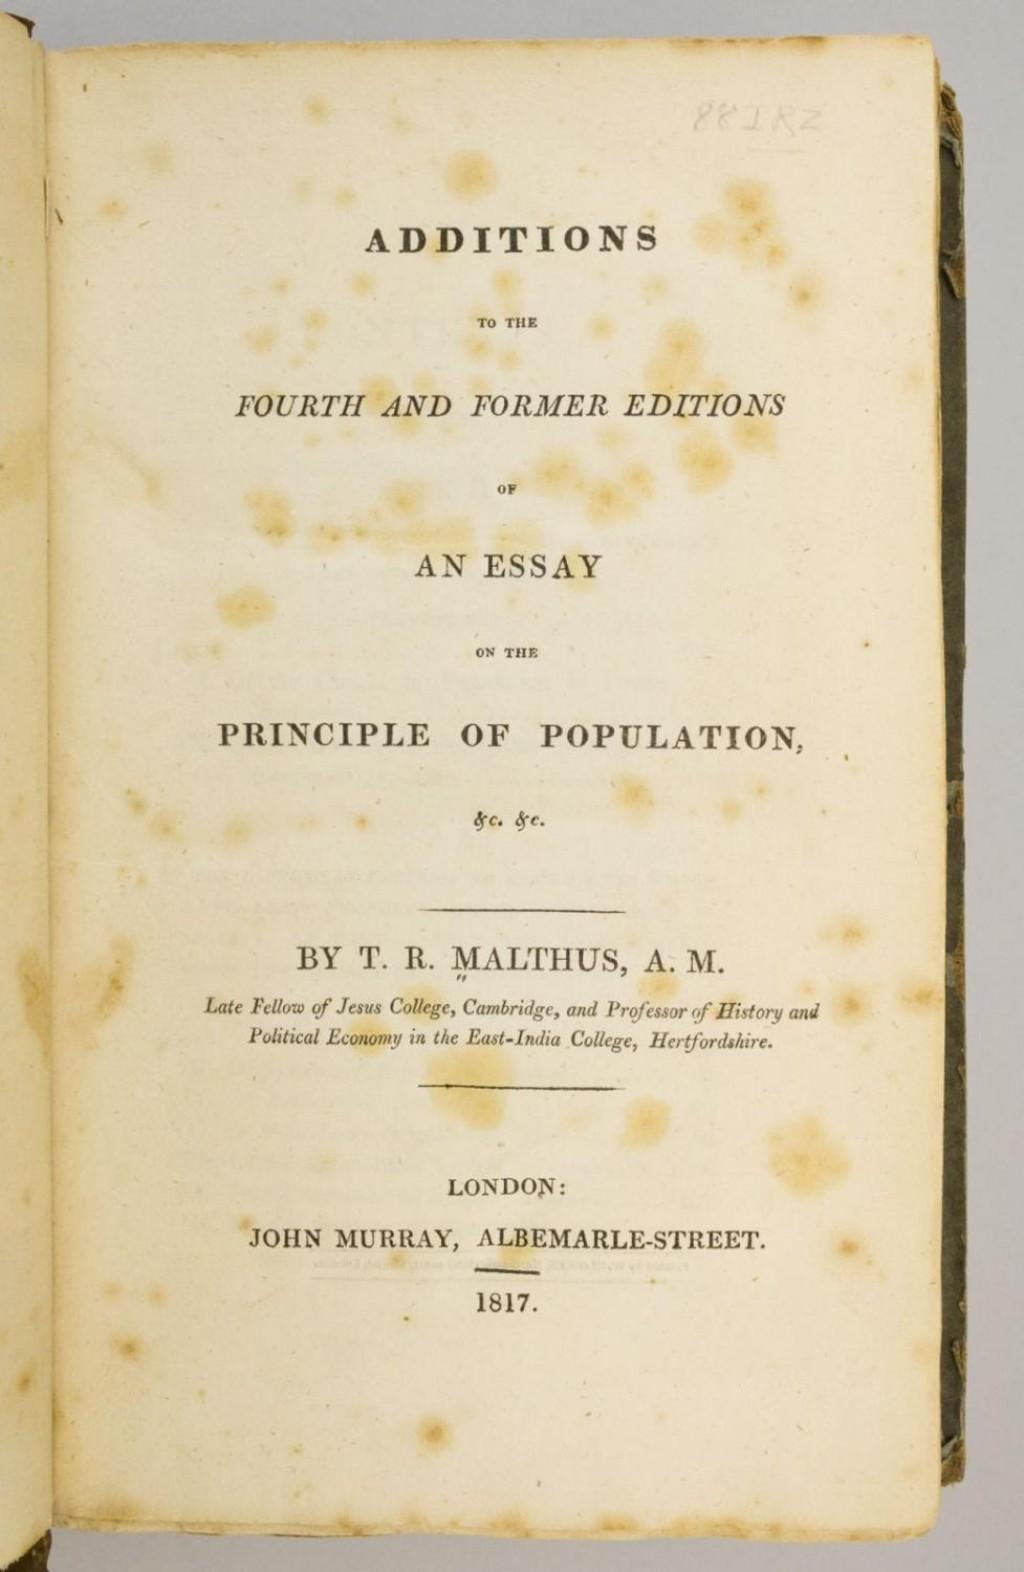 004 Essay Example 5337830061 2 Thomas Malthus On The Principle Of Stupendous Population After Reading Malthus's Principles Darwin Got Idea That Ap Euro Large